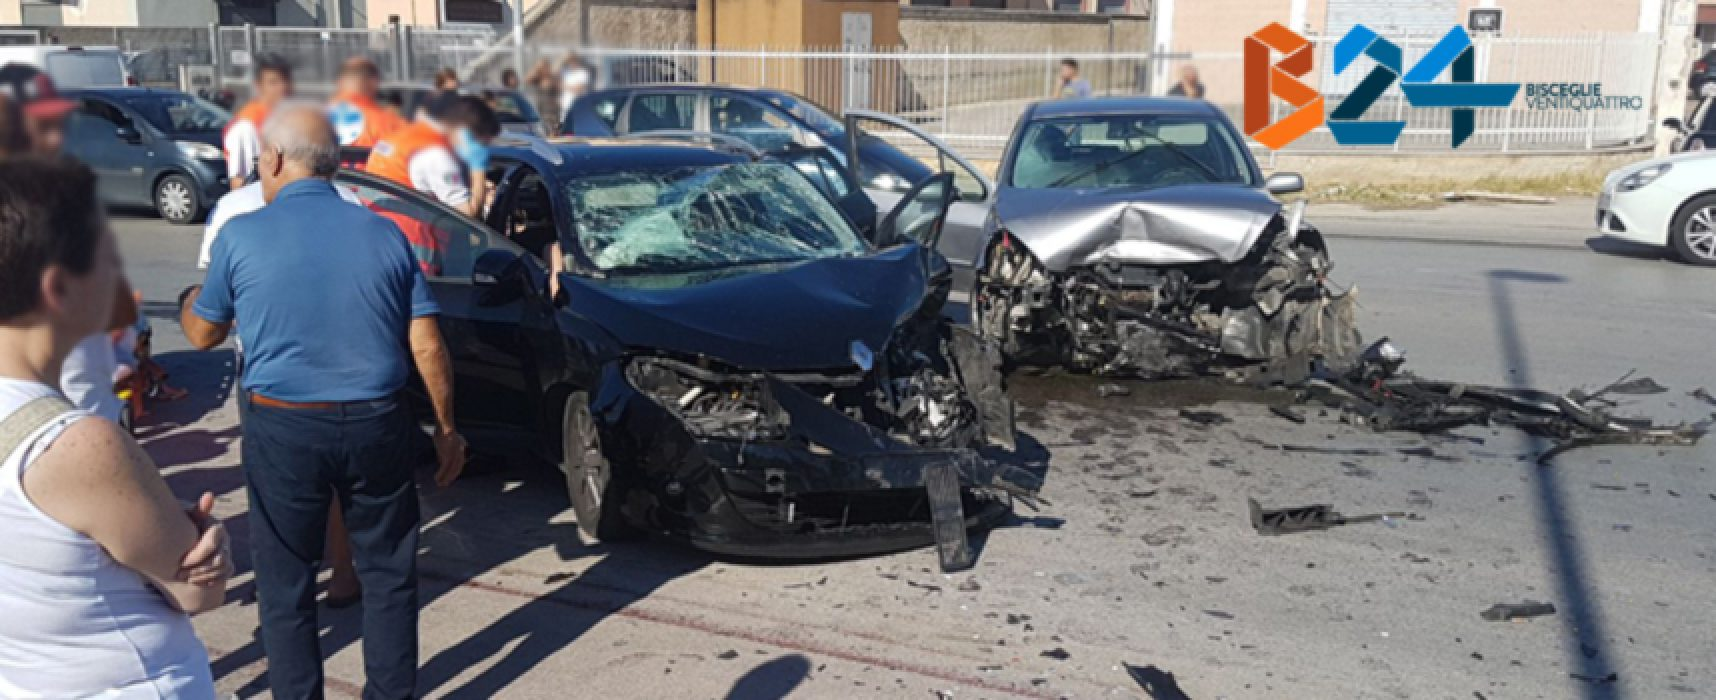 Violento frontale su via Ruvo, 6 feriti / FOTO